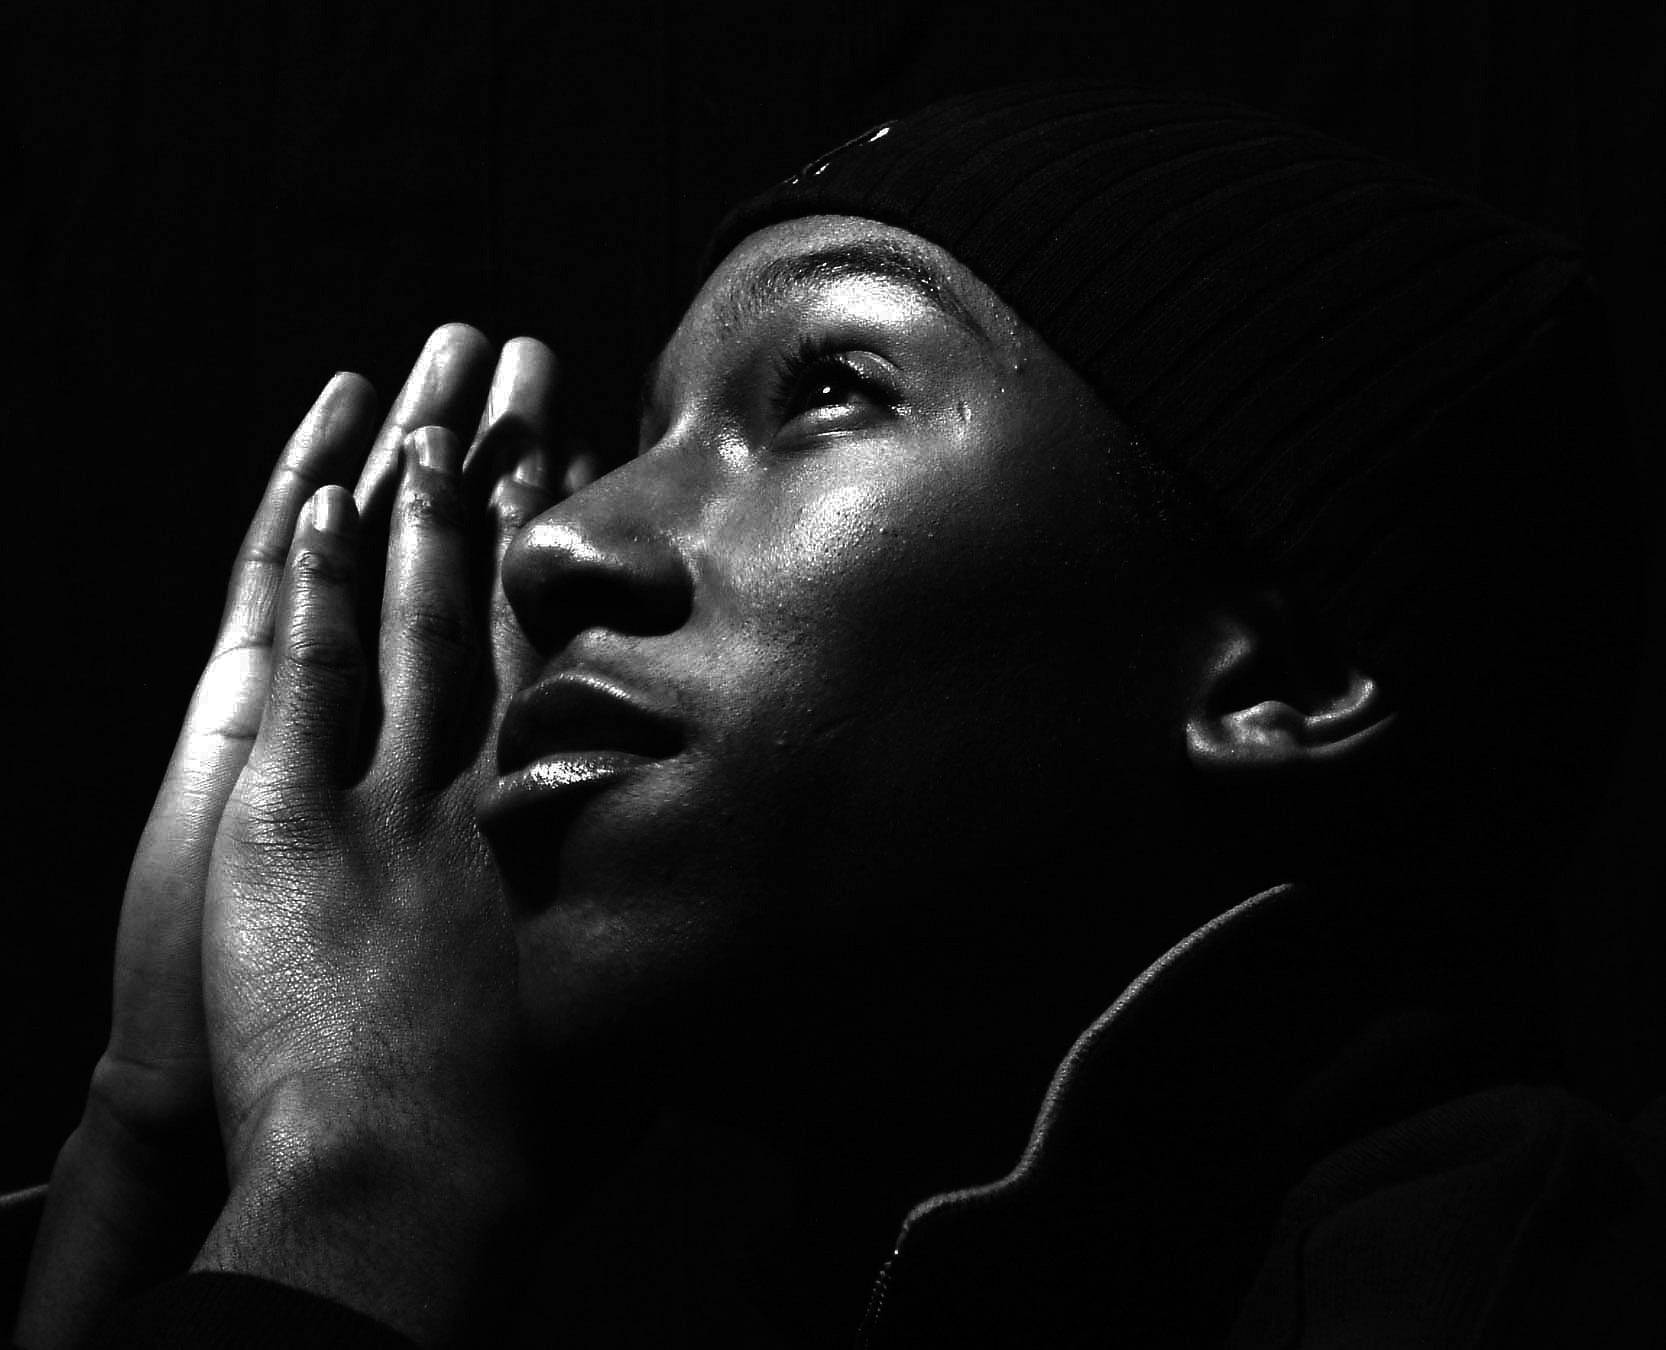 Black and white prayer